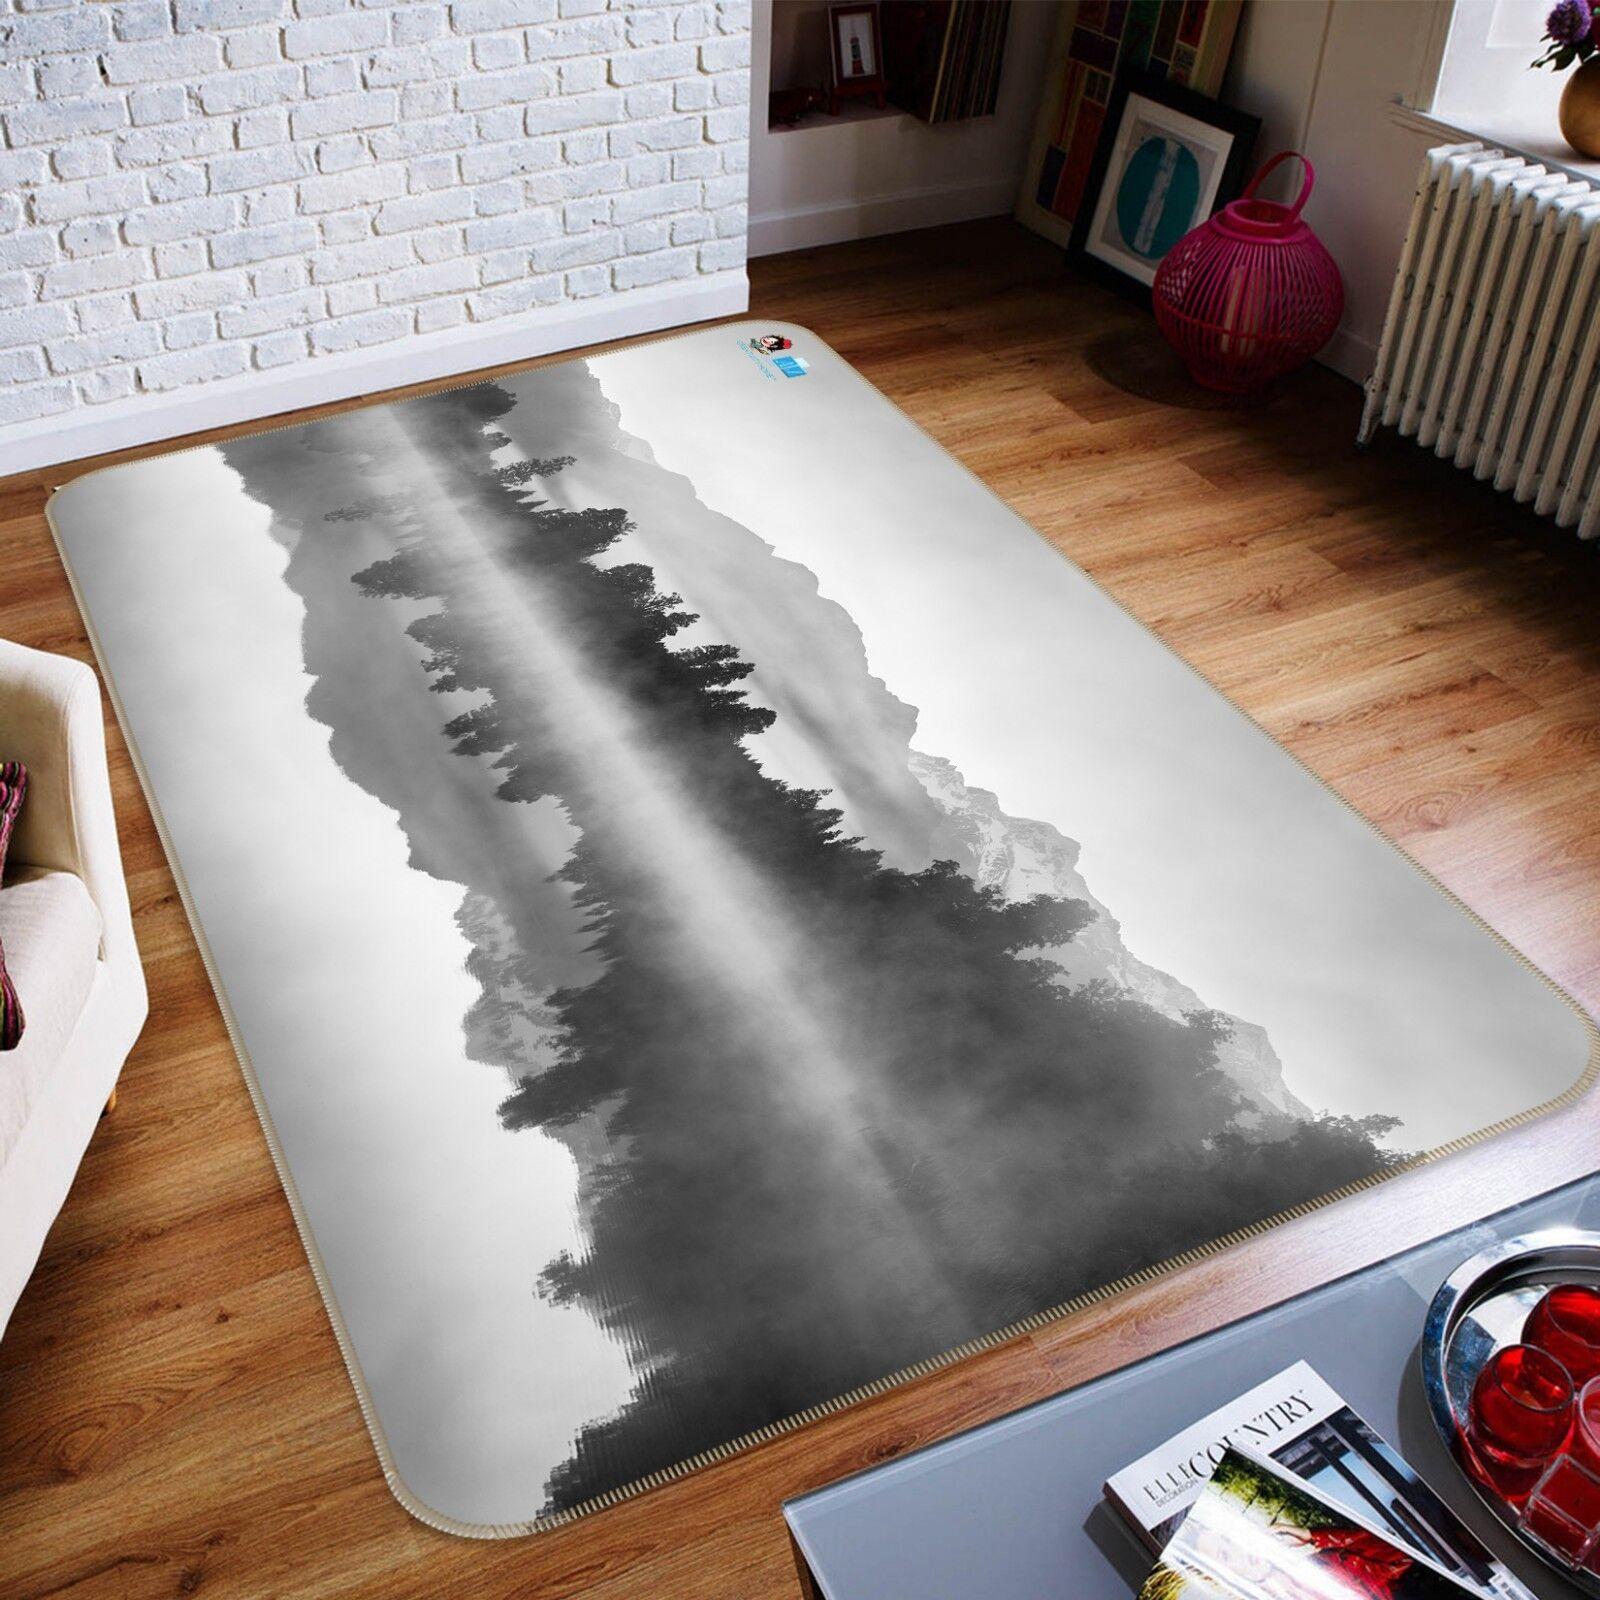 3D Forest Paysage 310 Étage Étage Étage Antidérapant Natte Élégant Tapis FR Tiffany 173aaf